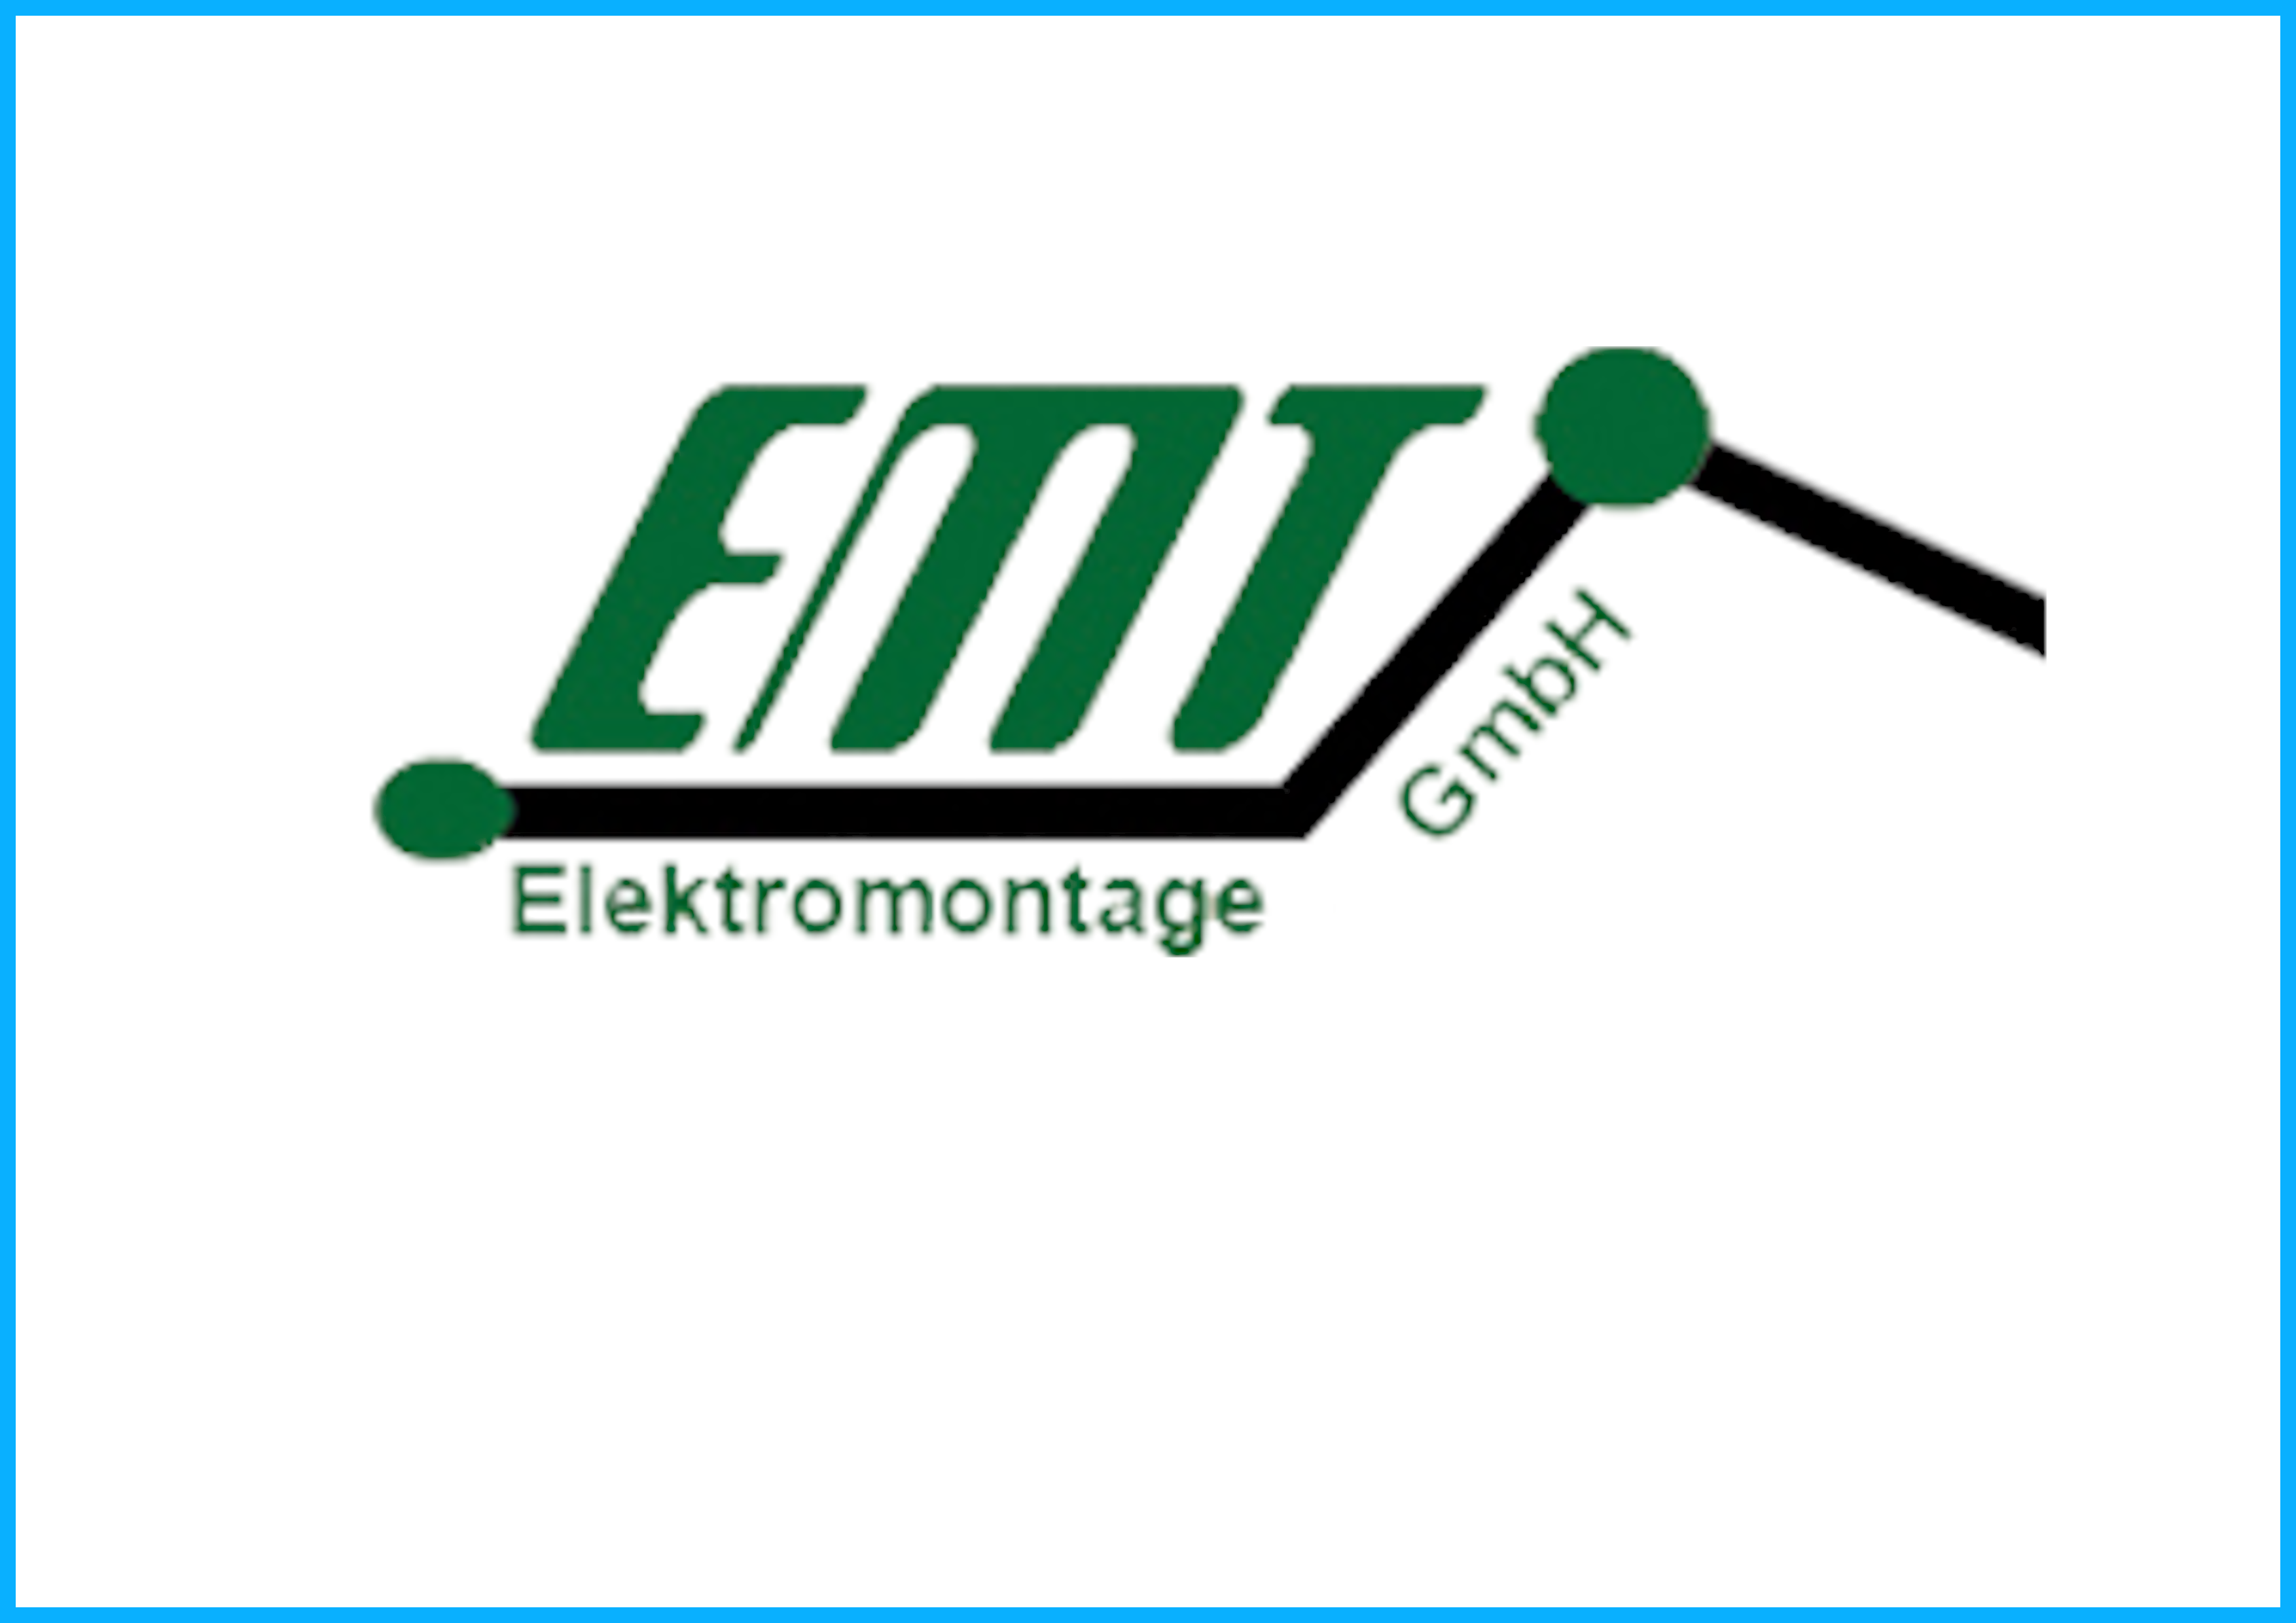 EMT Elektromontage GmbH